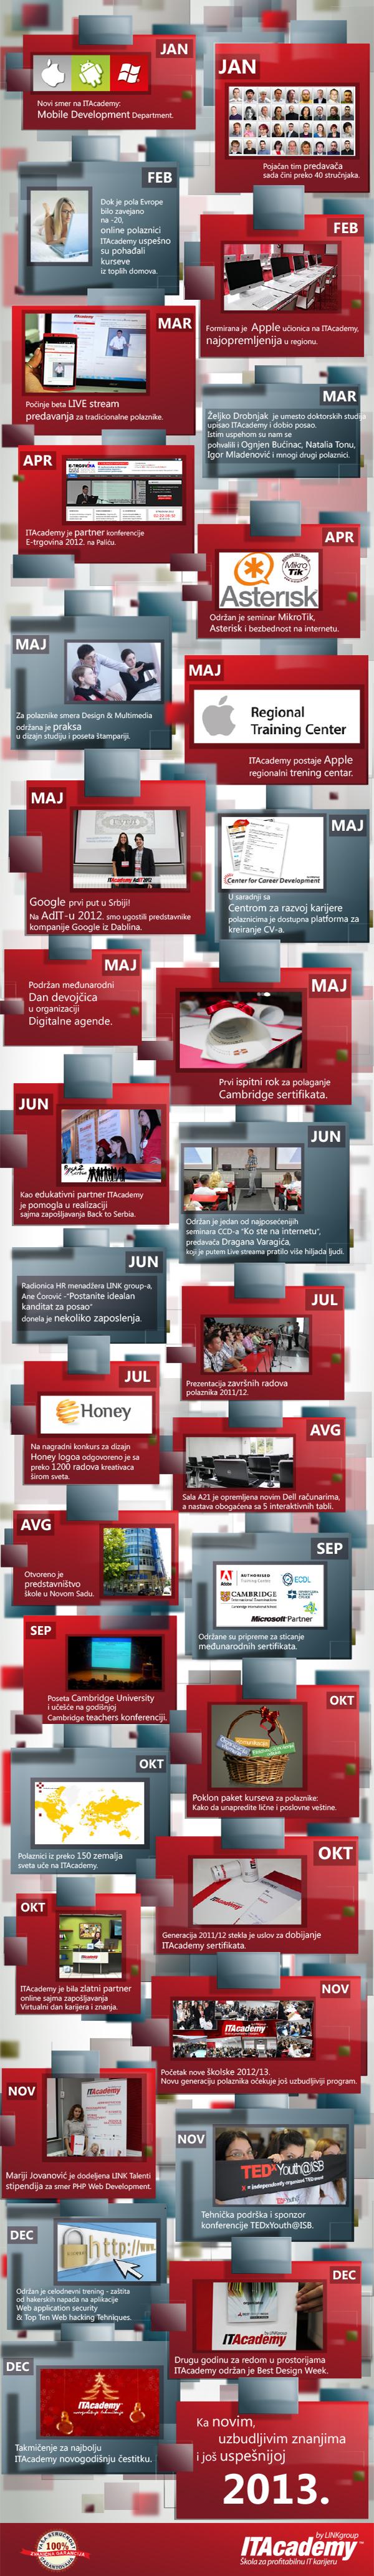 ita2012_infografik---timeline_.jpg